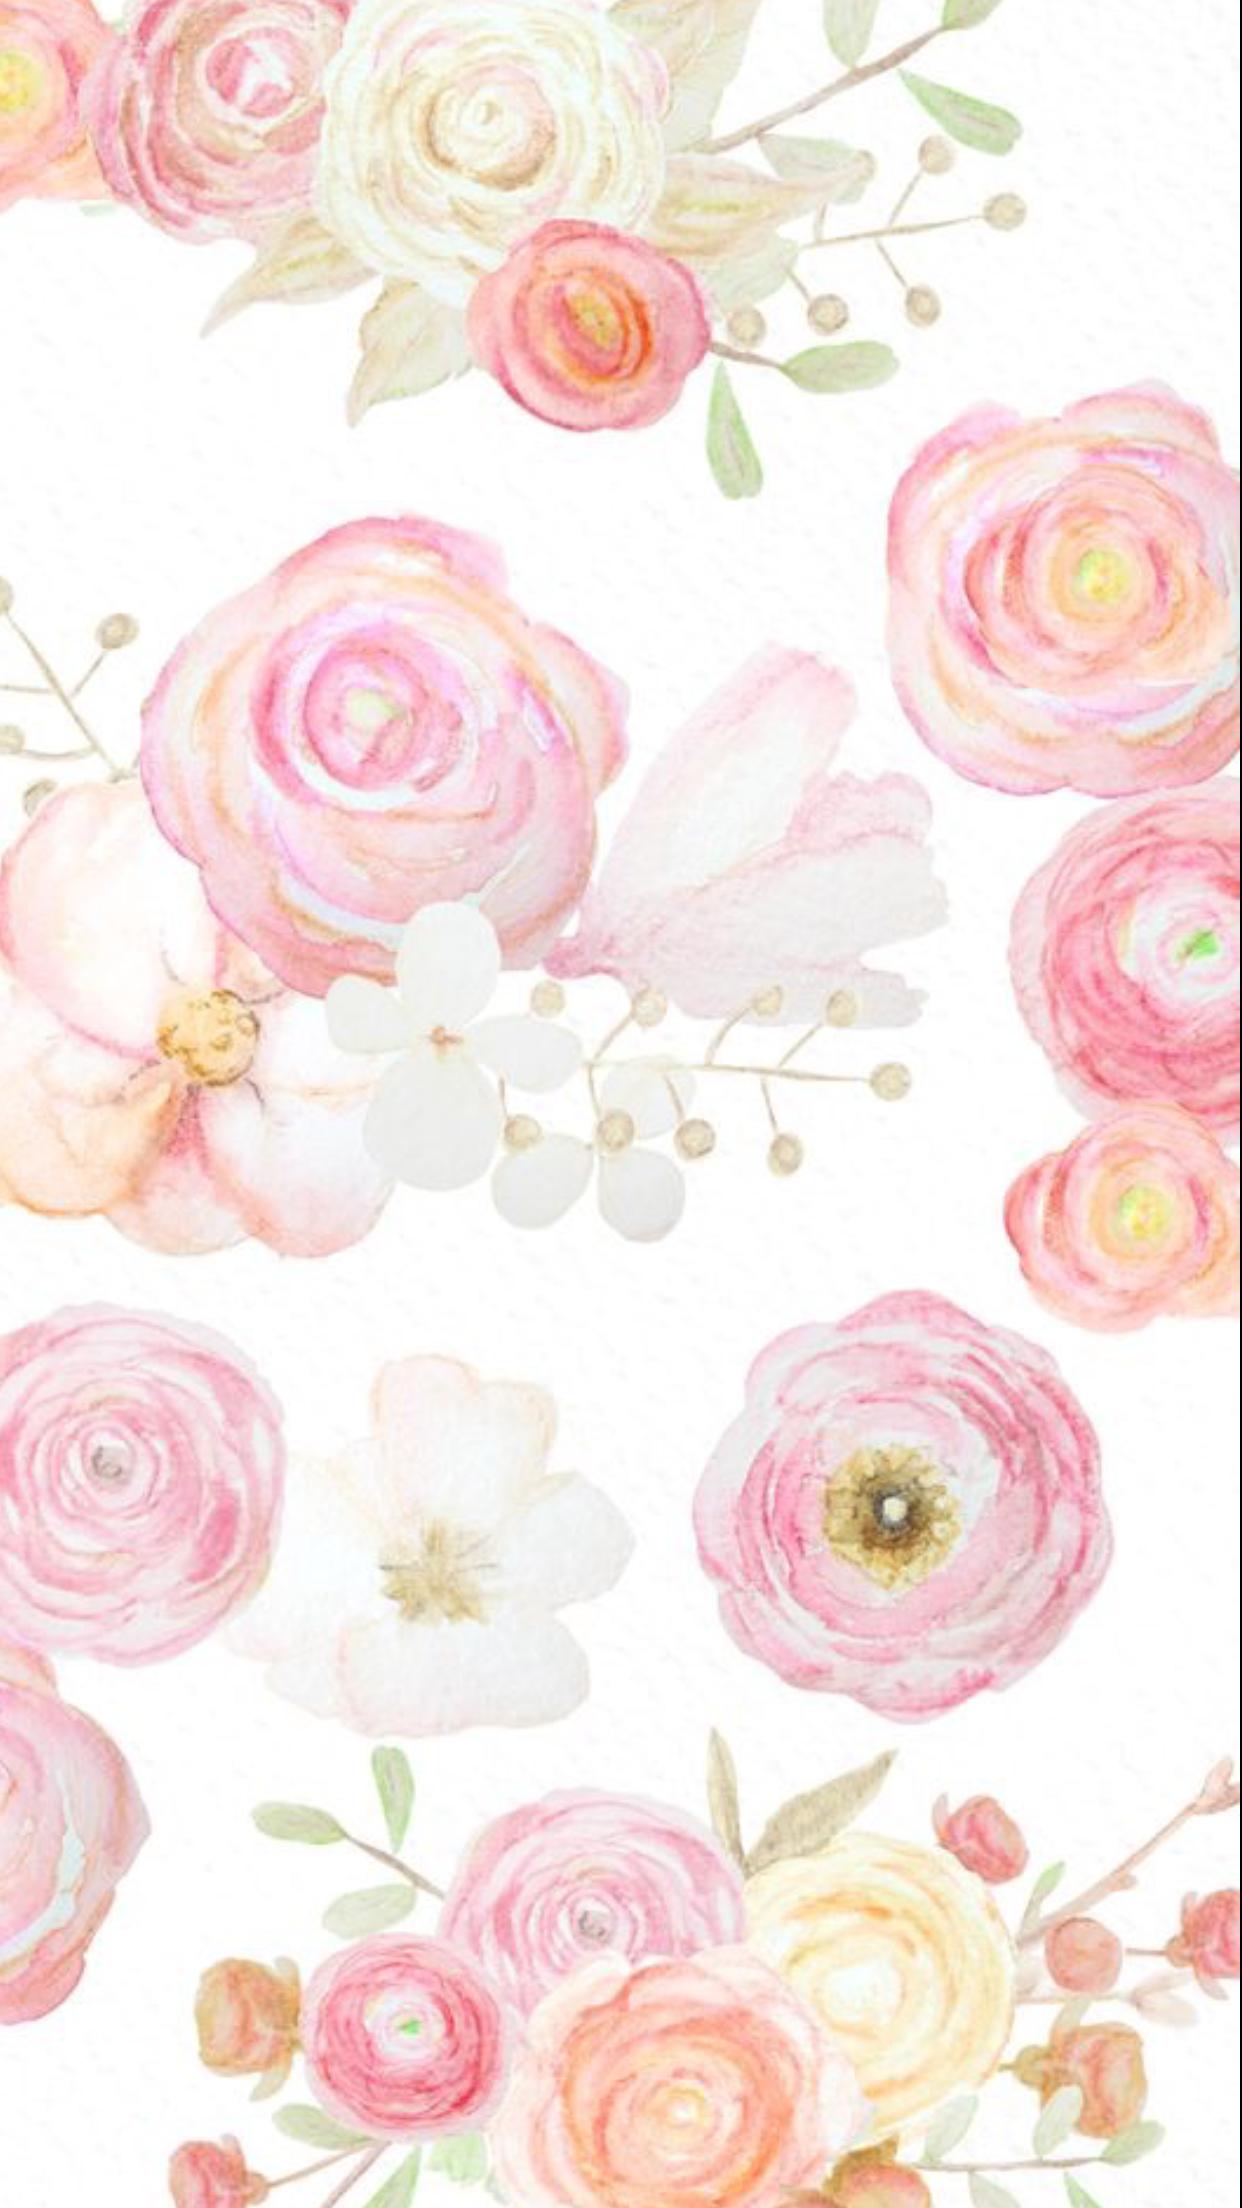 Iphone 6 Floral Watercolor Flowery Wallpaper Watercolor Floral Wallpaper